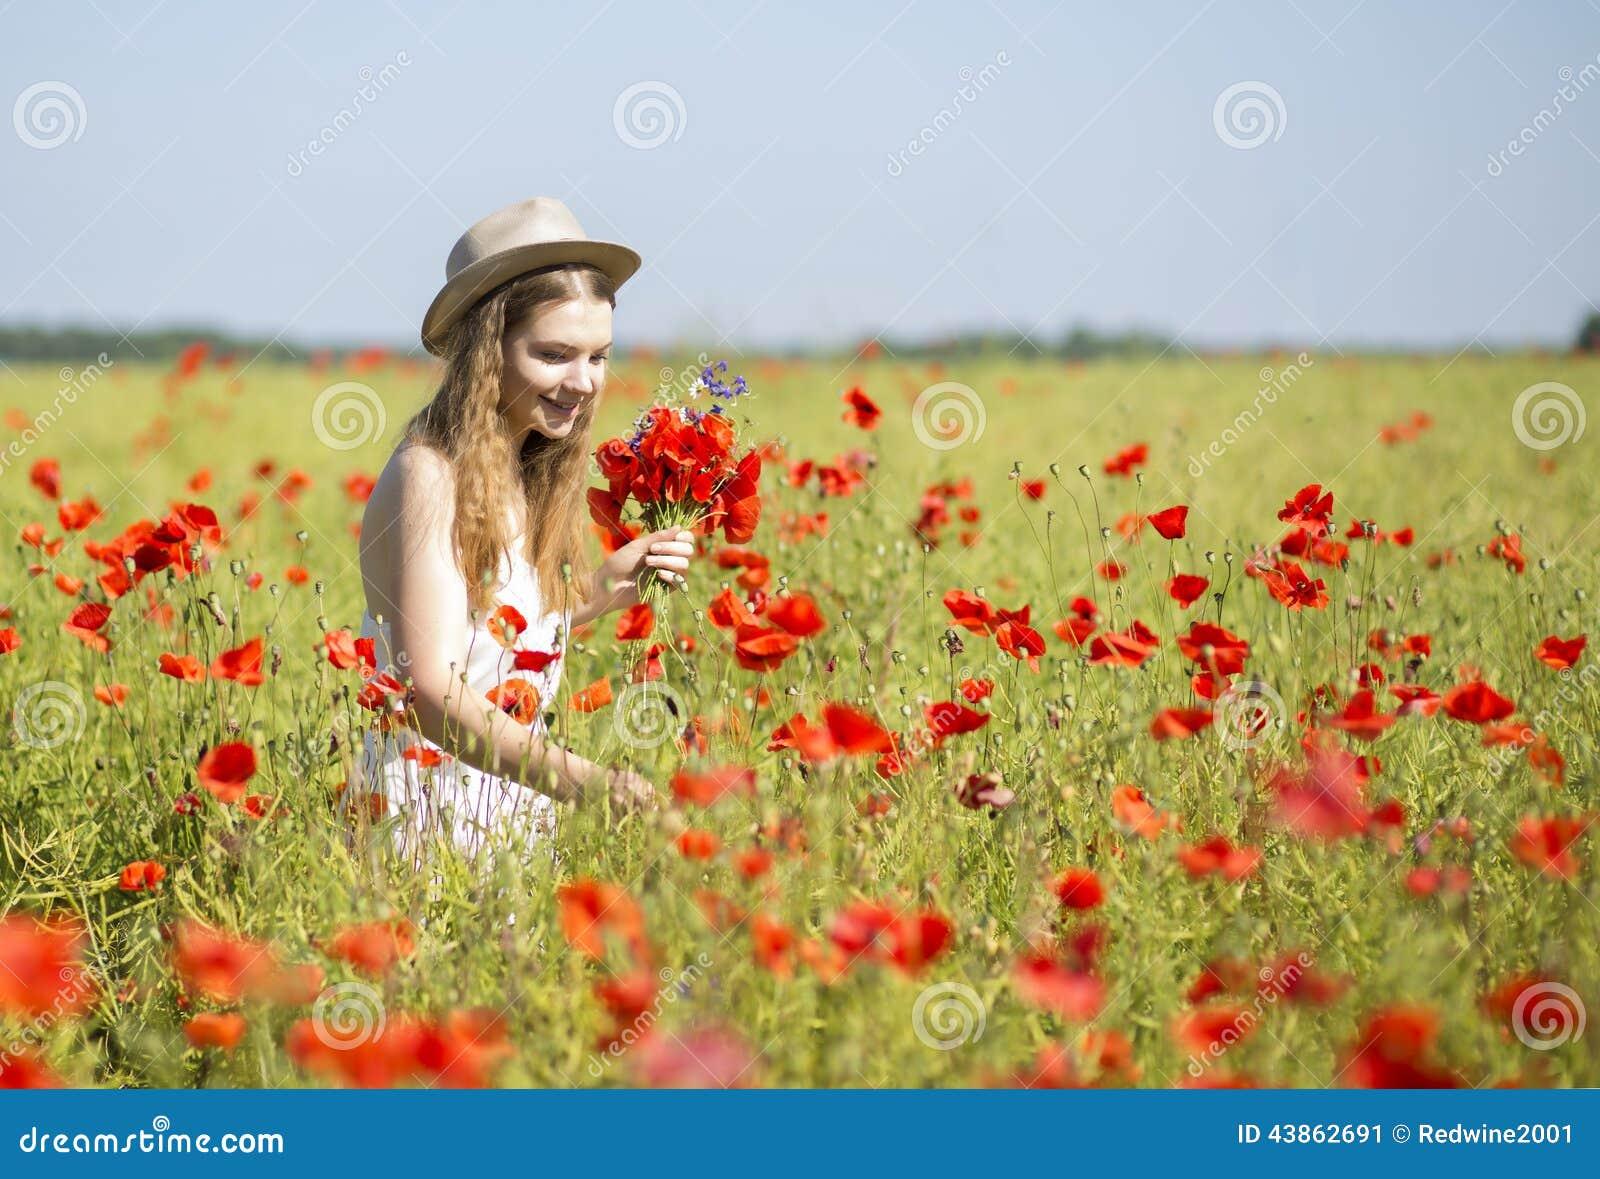 Woman at white dress search beatiful flower